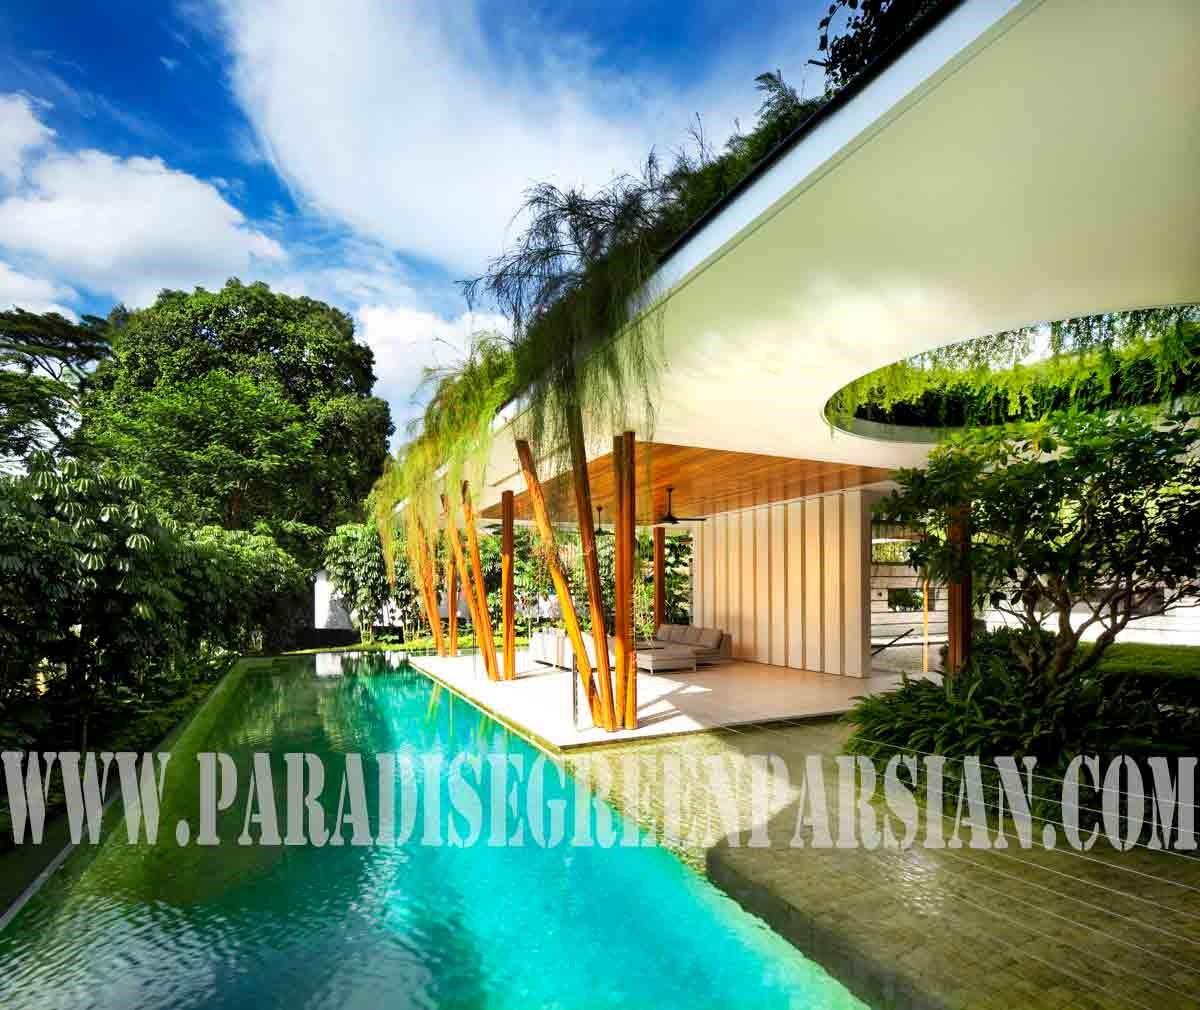 roof garden and landscape 2 خانه ای با محوطه سازی پویا و روف گاردن